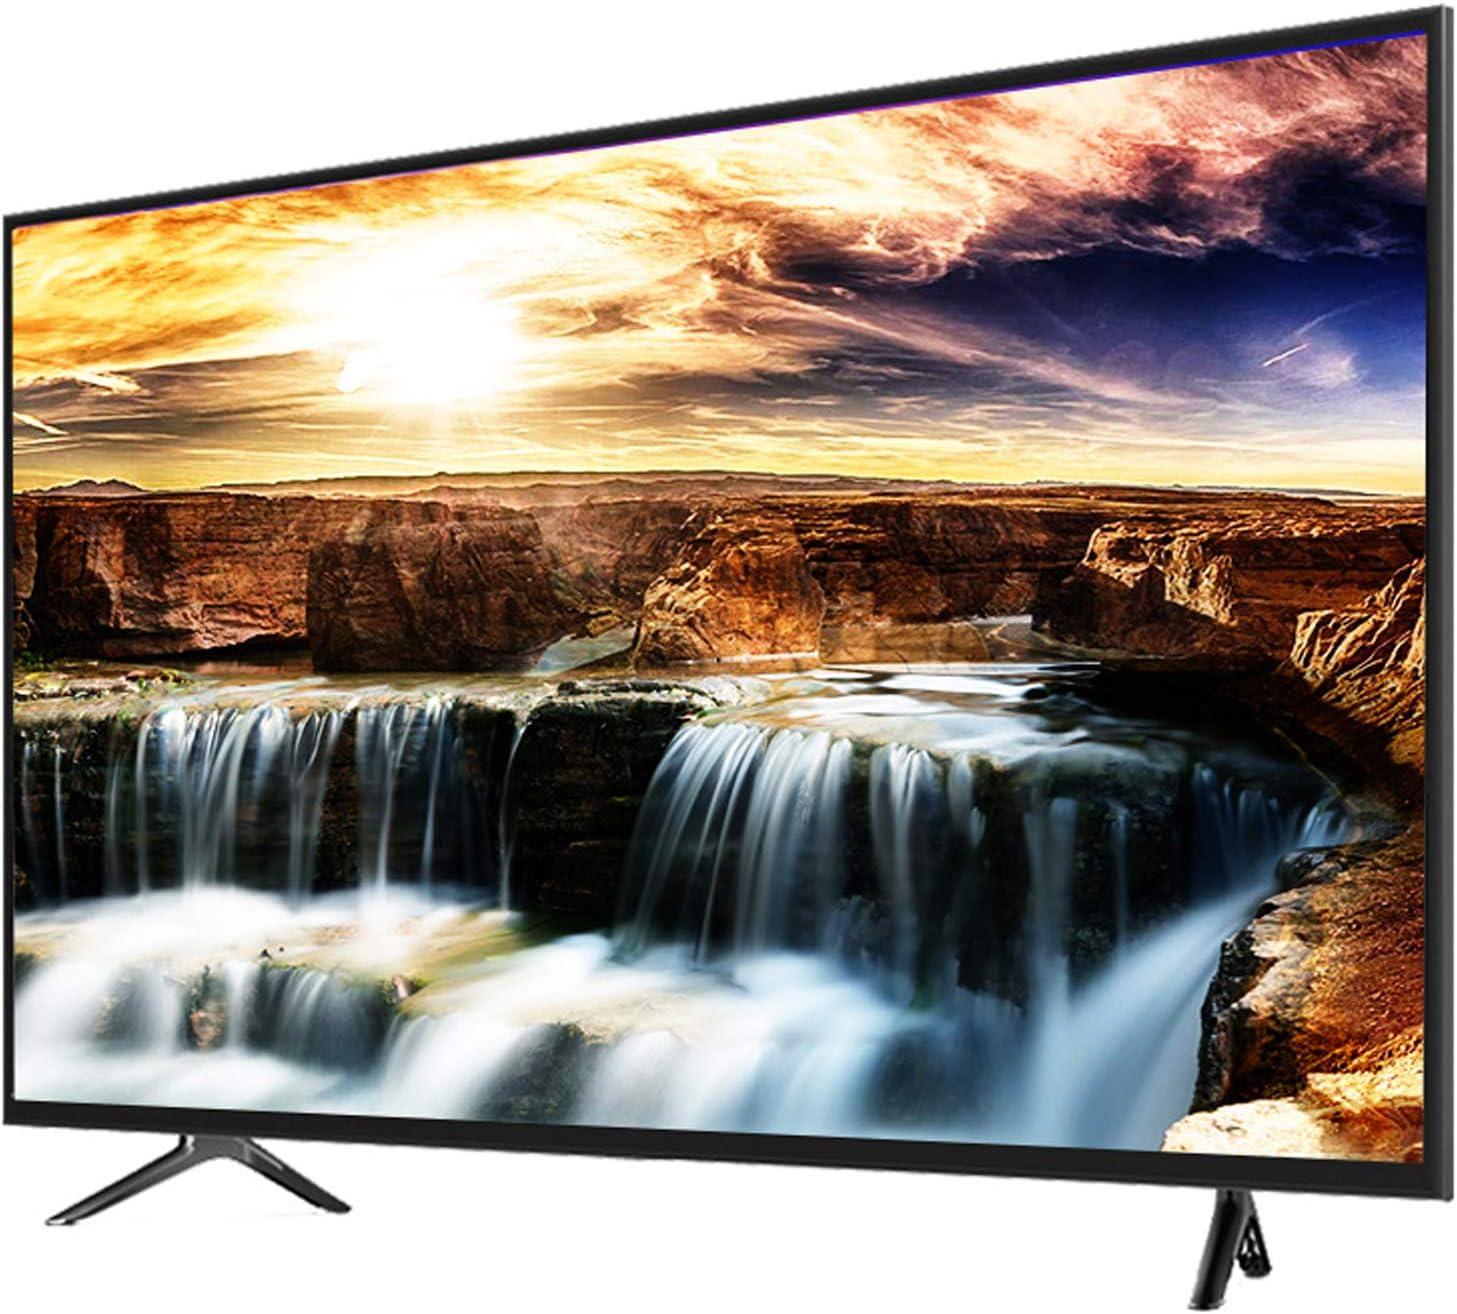 YILANJUN Televisor HD LCD - 32/42/50/55/60 Pulgadas Smart UHD TV 4K [WiFi + Multifunción + Configuración Alta] (Proyección Inalámbrica + Control por Voz)